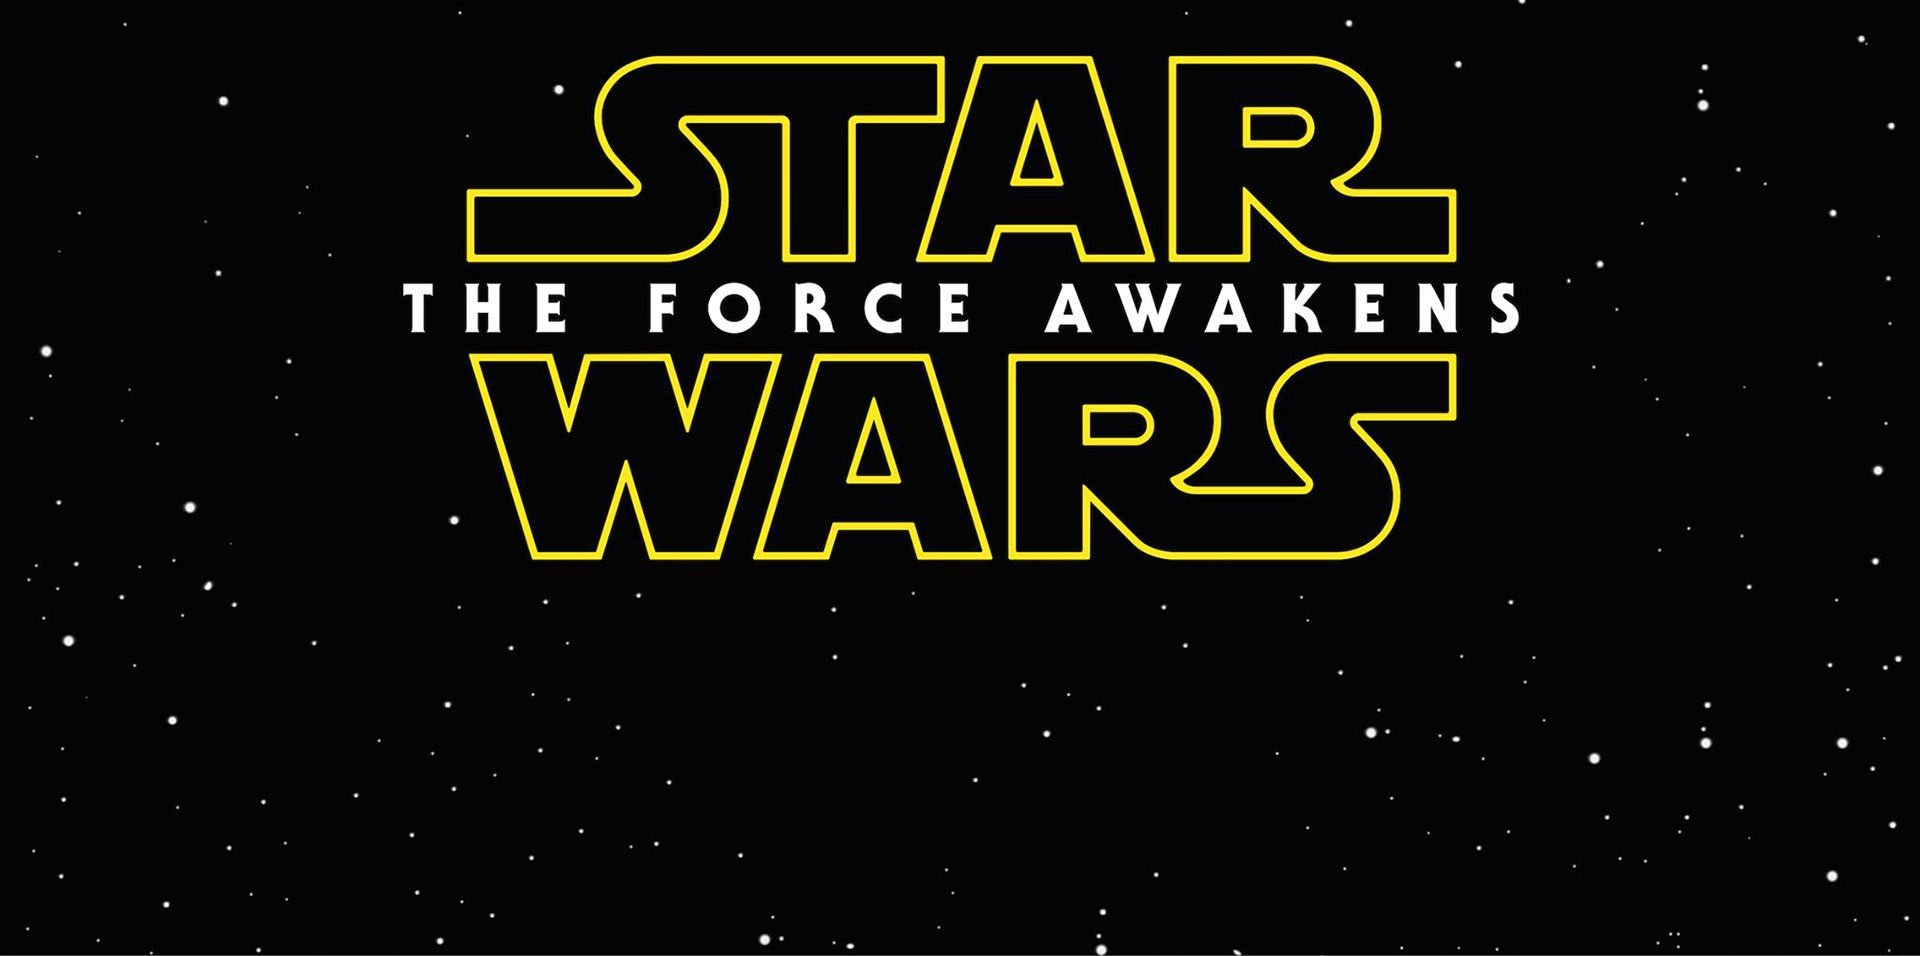 Star Wars: The Force Awakens Teaser Trailer Unveiled